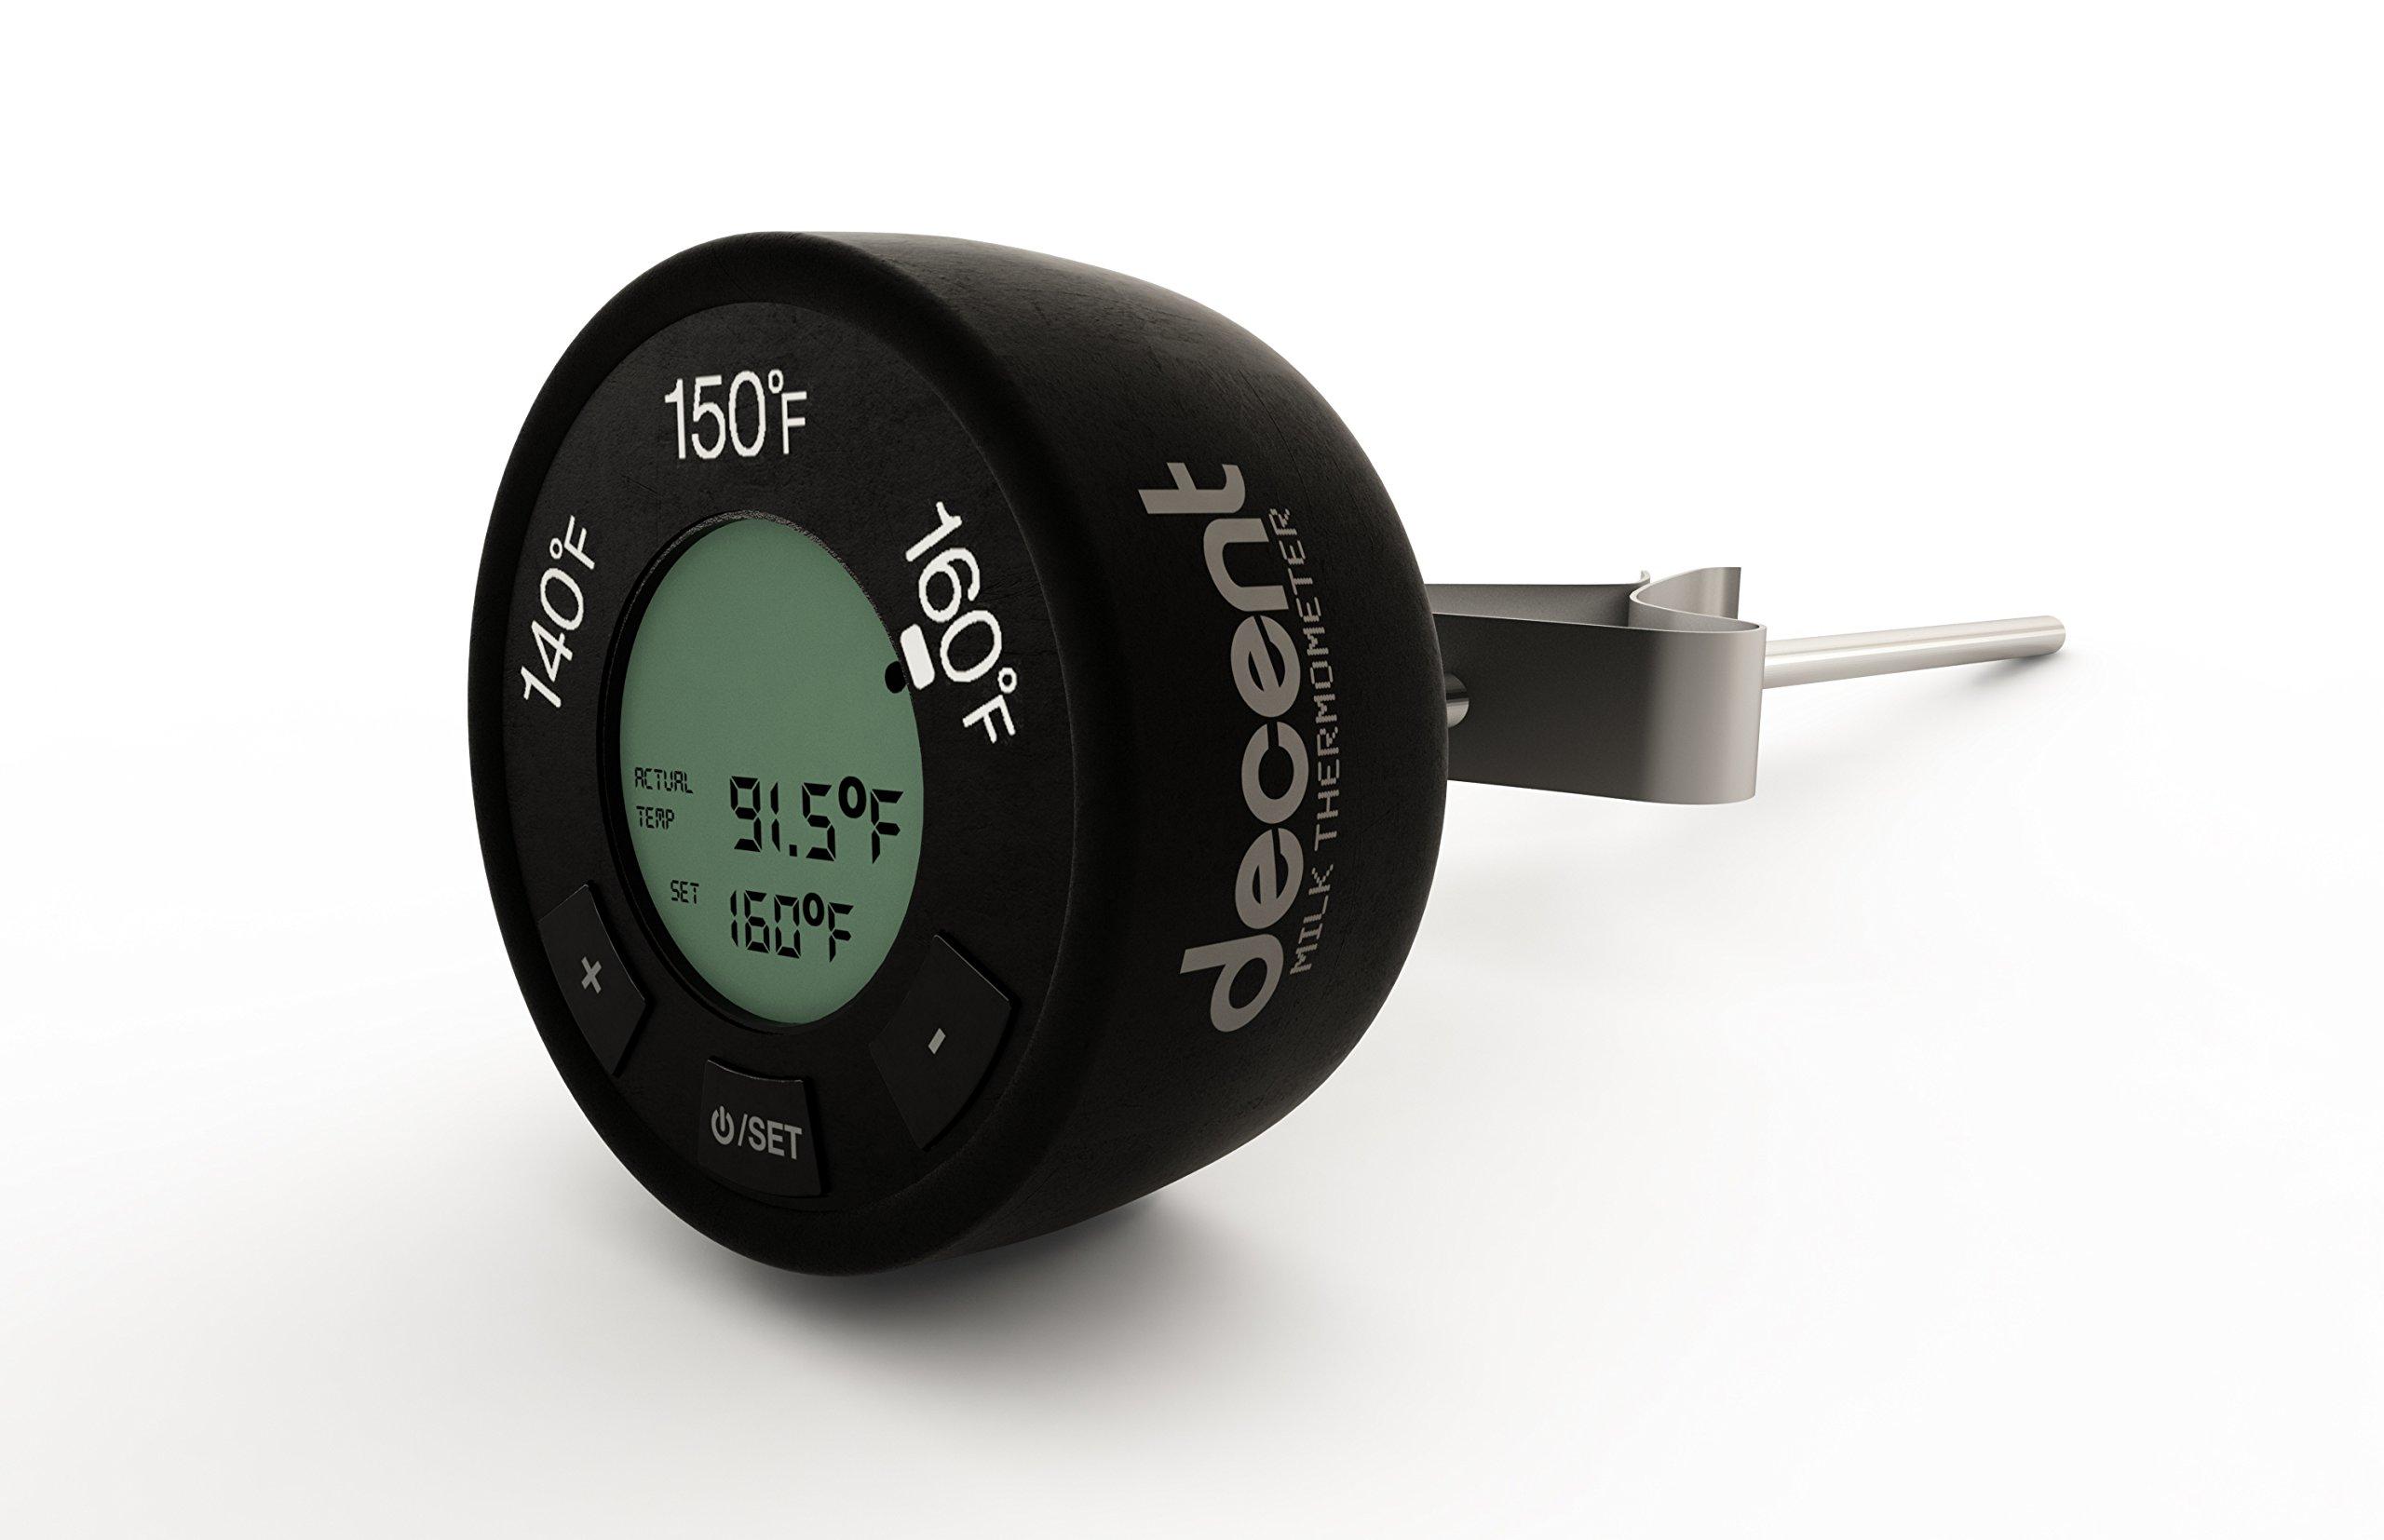 Digital Milk Thermometer (Fahrenheit) by Decent Espresso